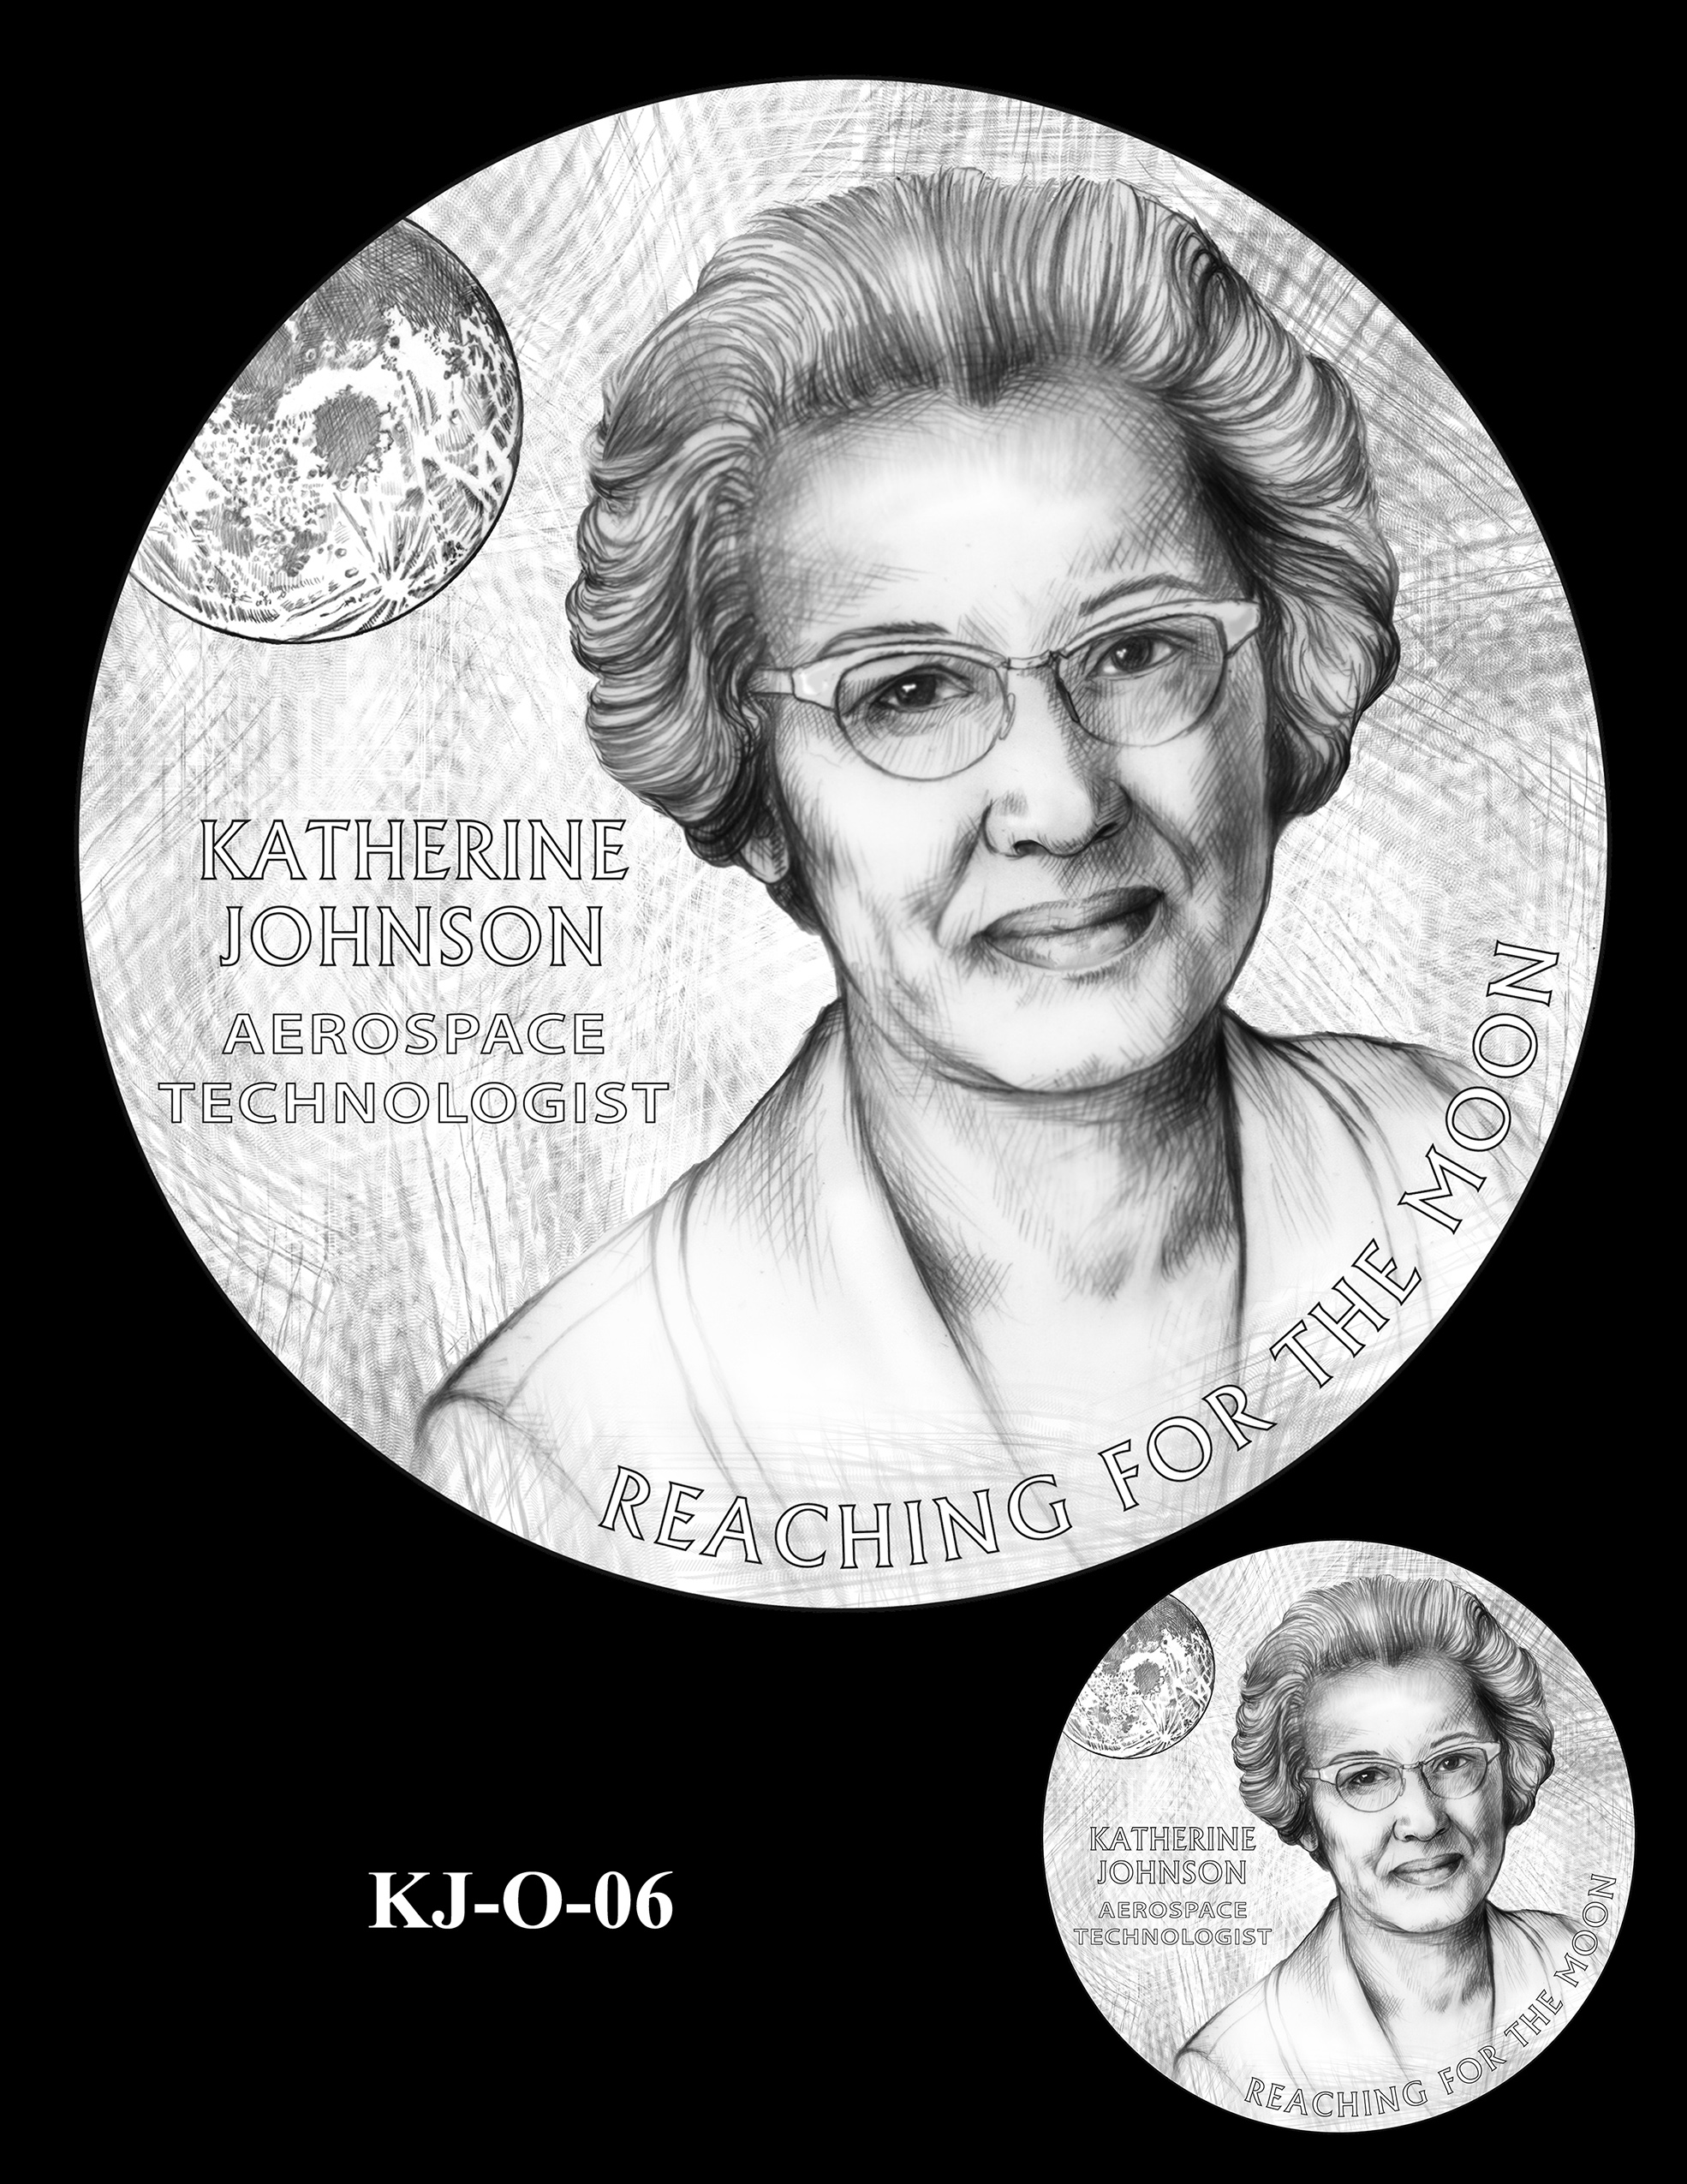 KJ-O-06 -- Katherine Johnson Congressional Gold Medal